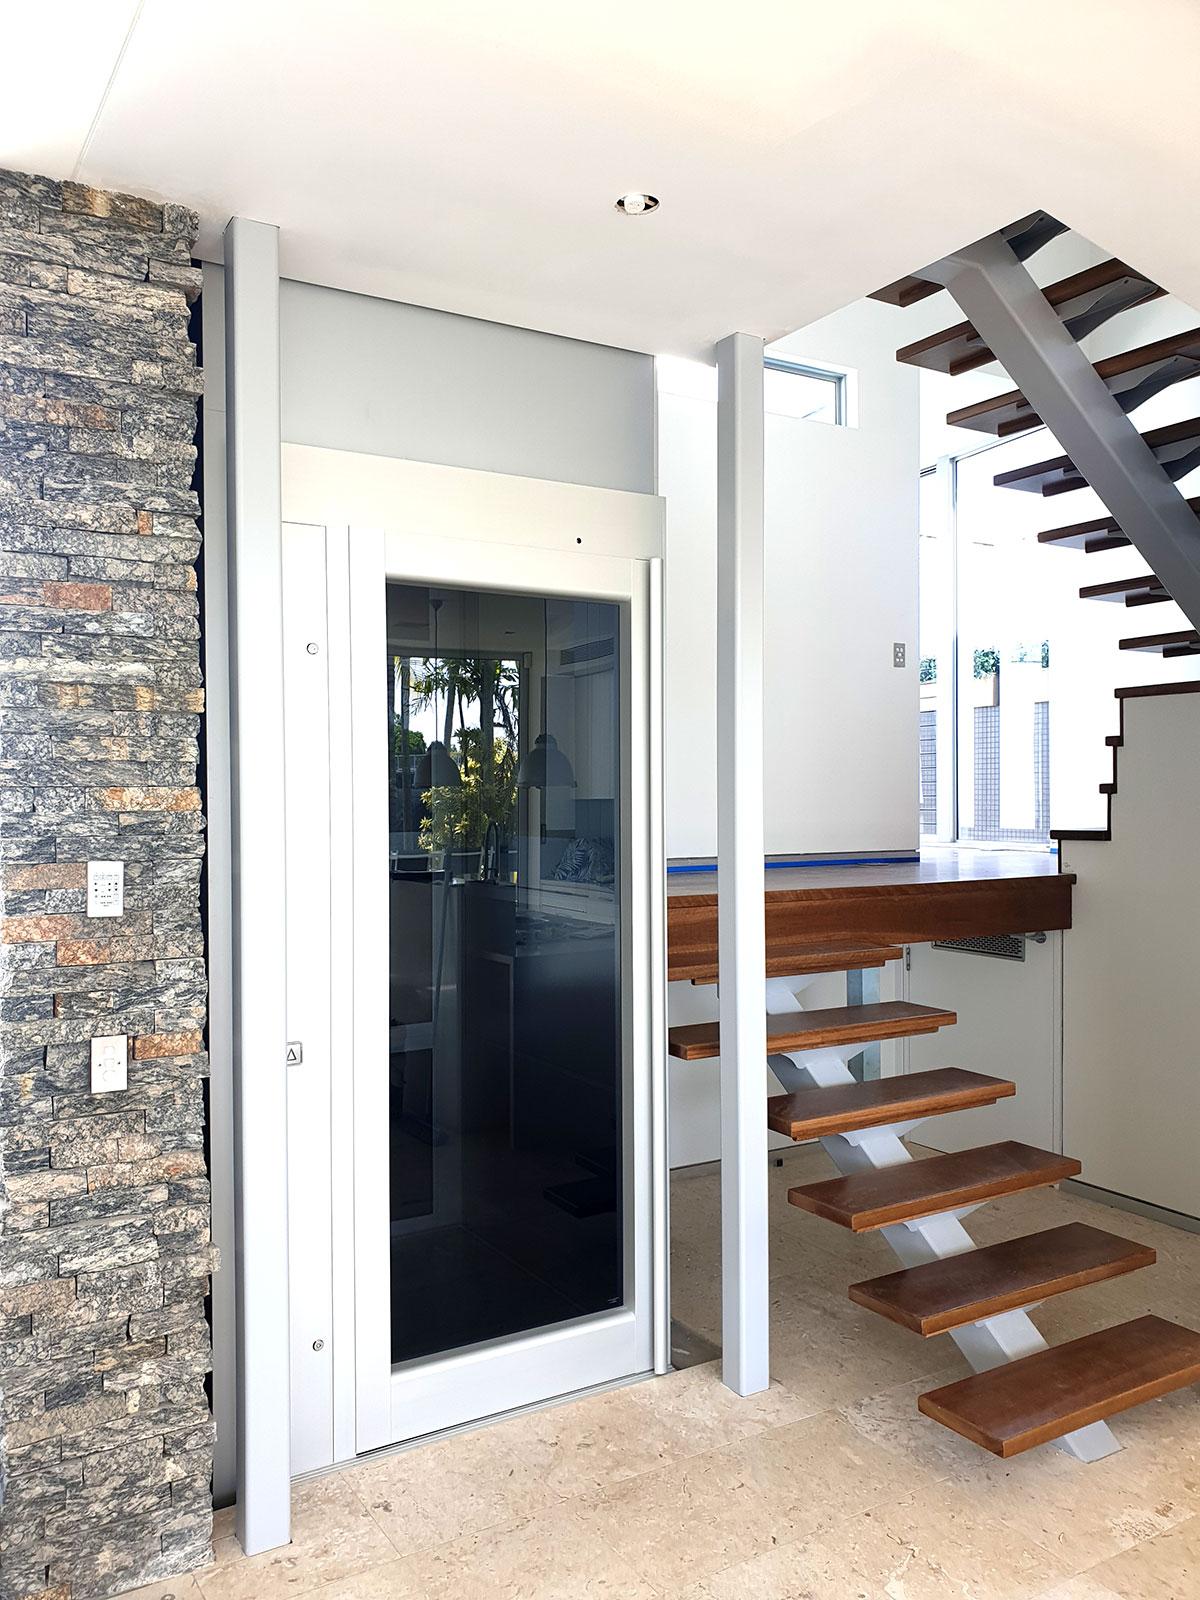 Flex-e Home Lift in Noosaville Queensland